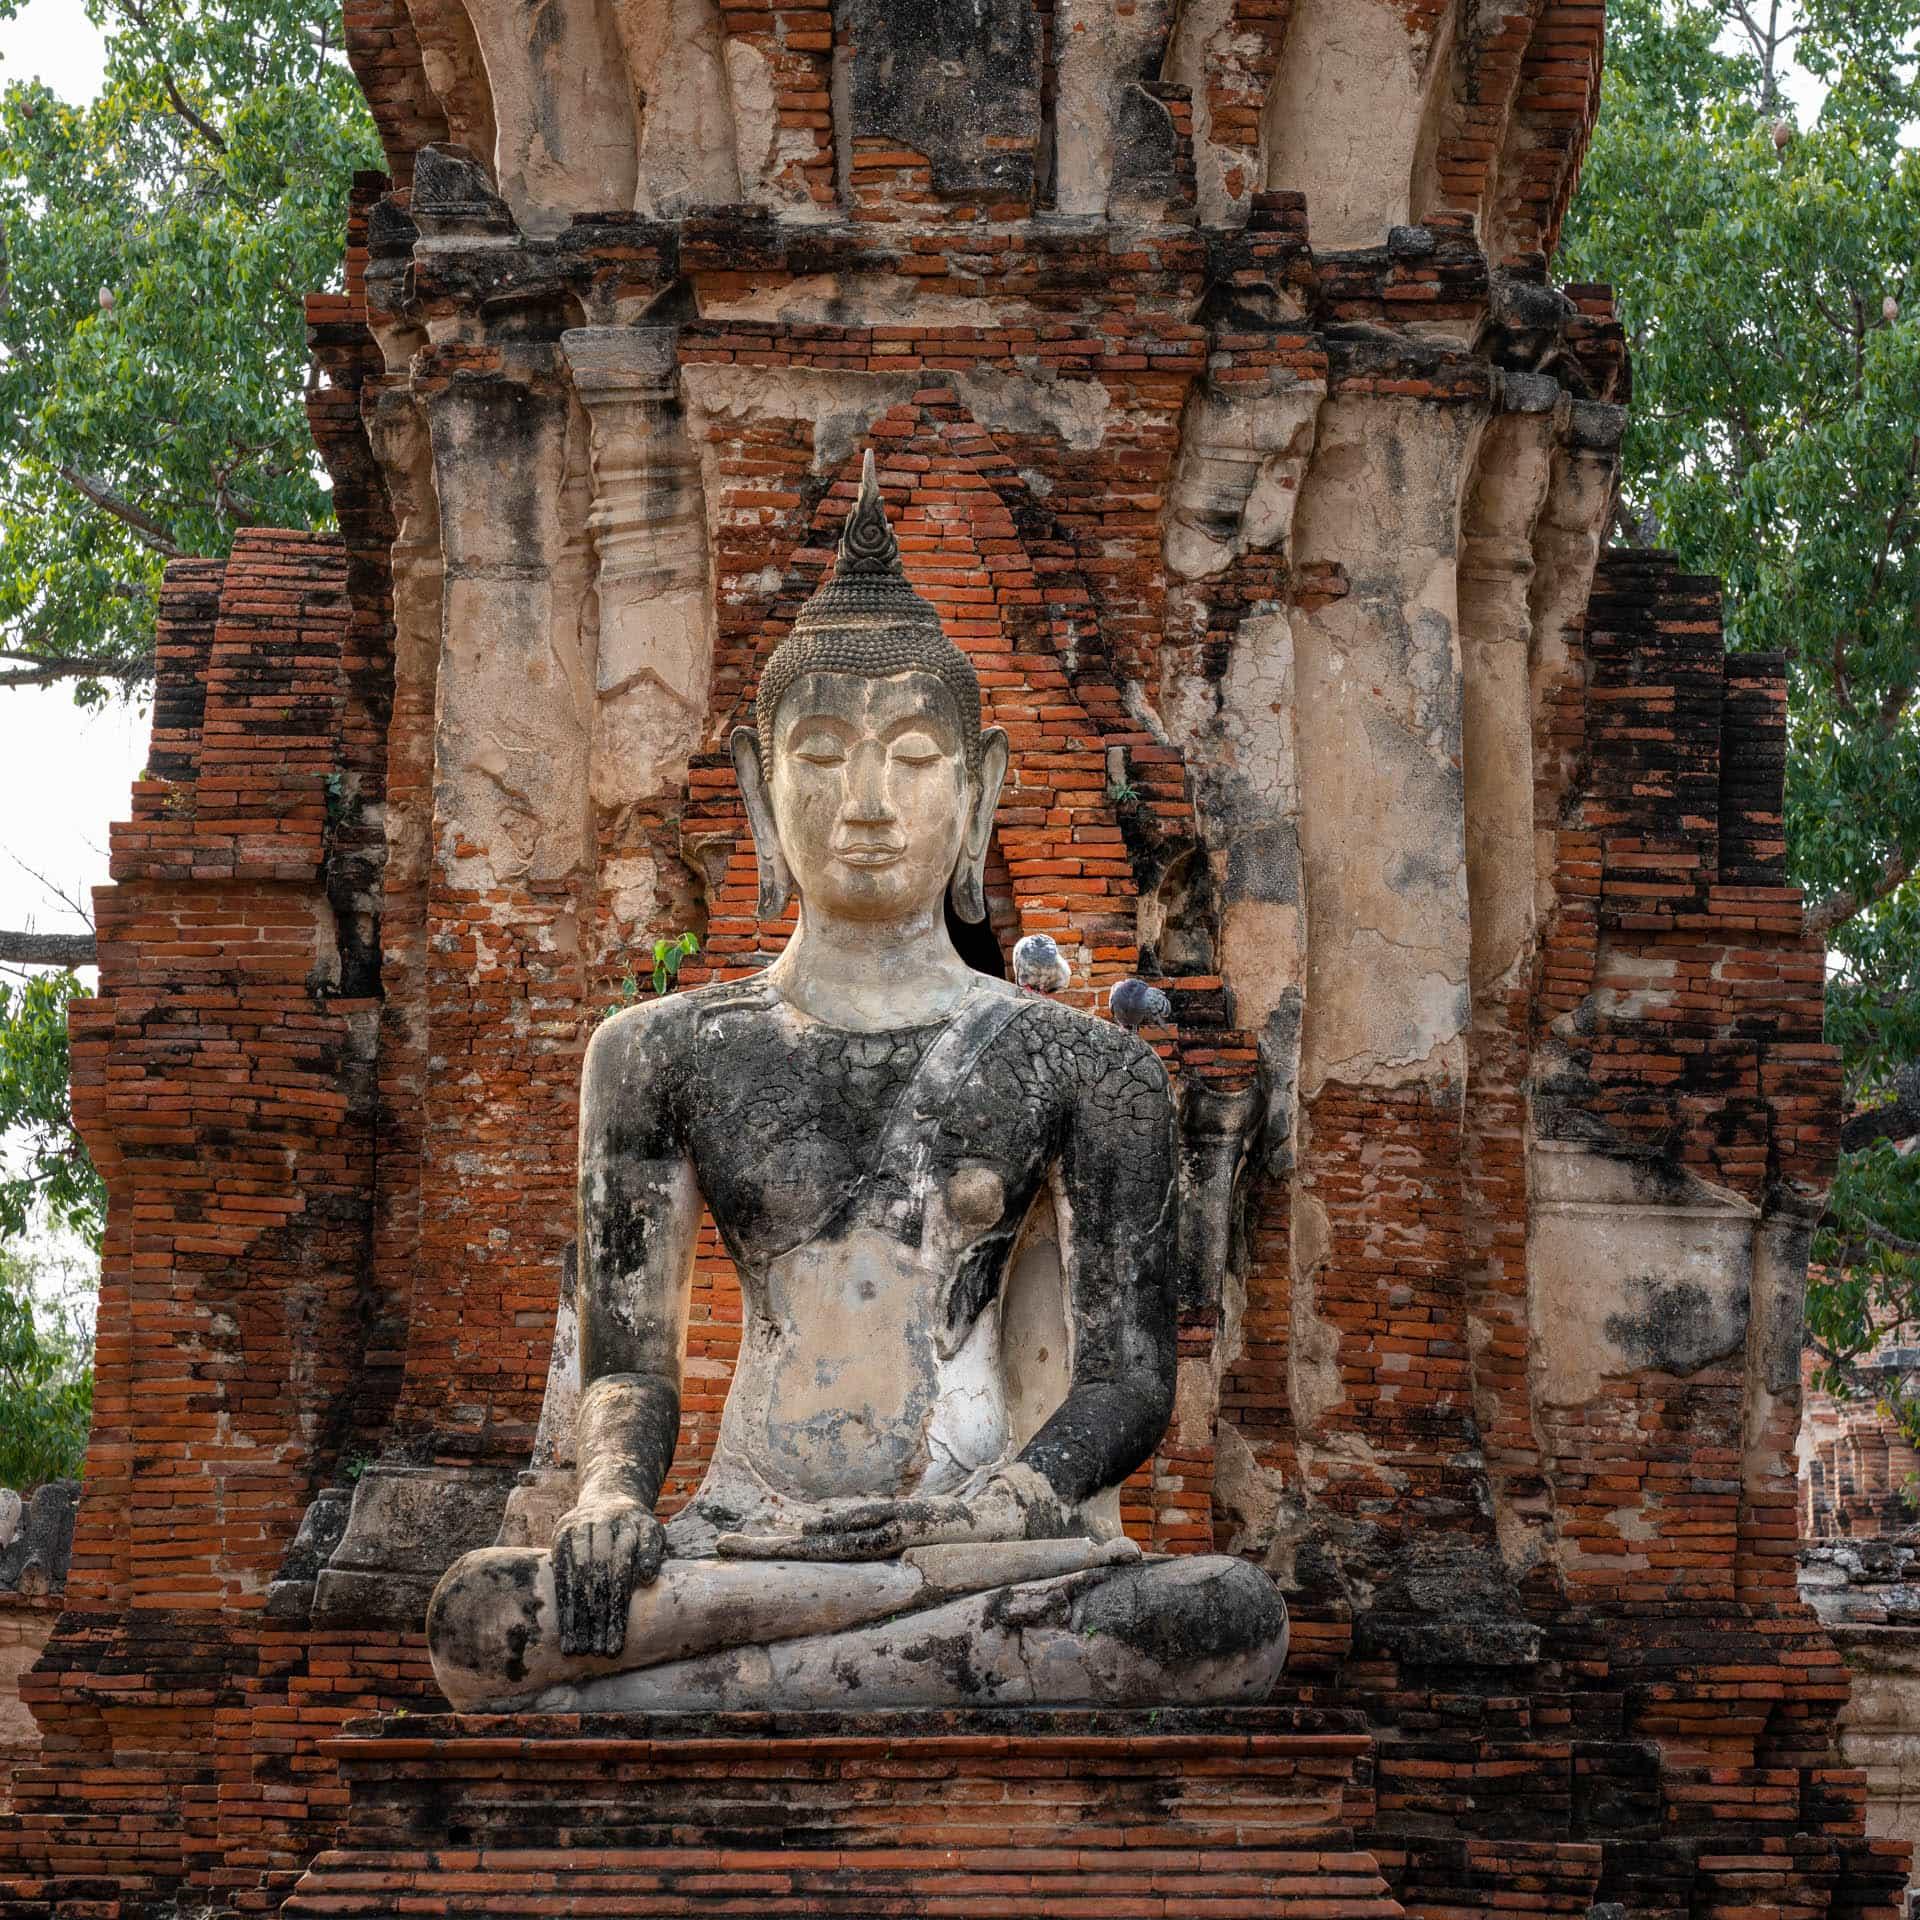 Buddha statue in Ayutthaya | f/8 1/125sec ISO-500 105mm